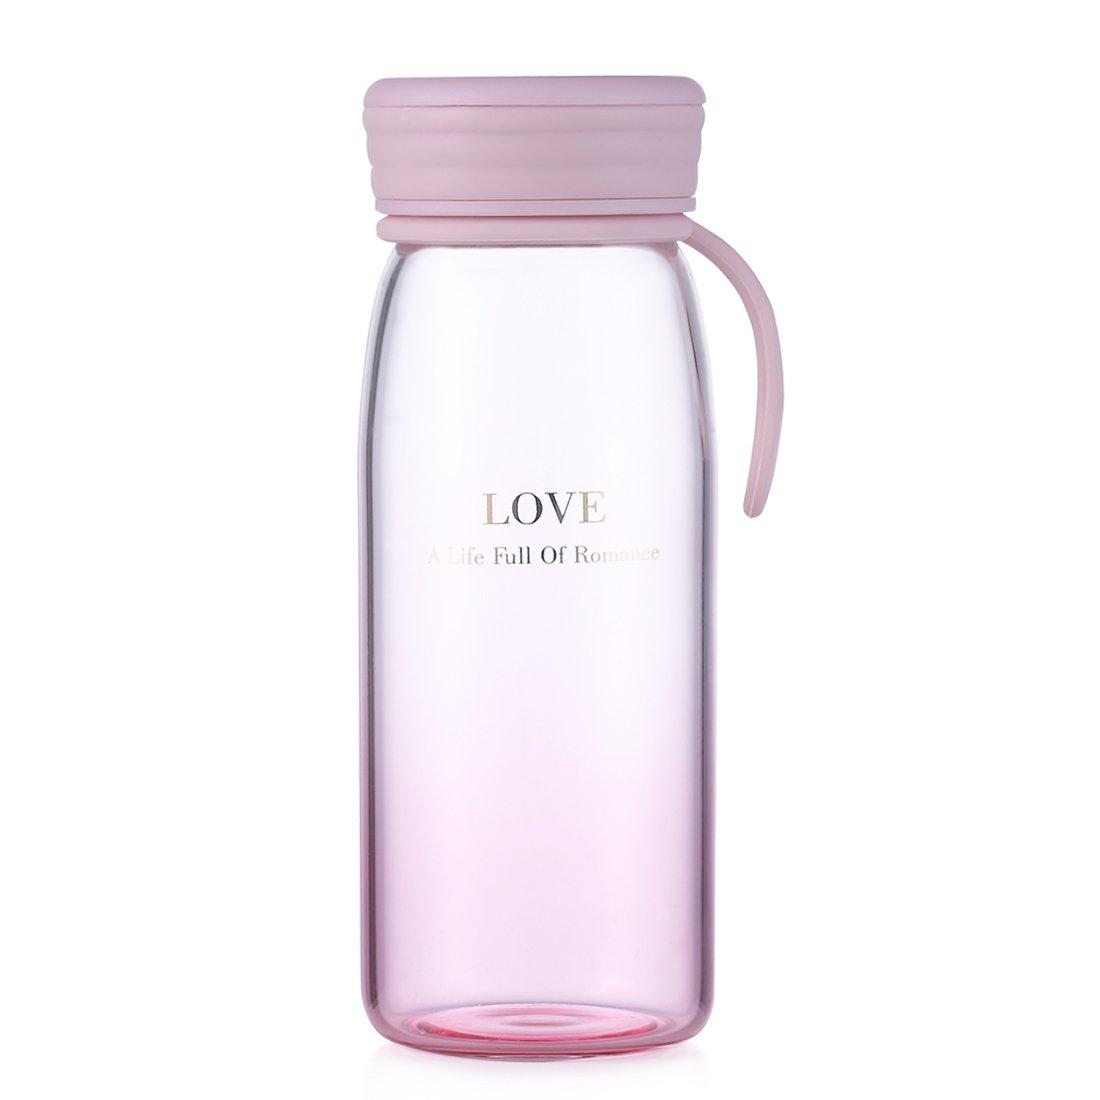 HOLD U FUN 400ML//13.5oz Travel Glass Water Bottle,Colorful Sport Leak-Proof Milk Cup,Outdoor Glass Drinkware for Girls/&Kids,Lovely Mug Lovely Mug QuanJinRui Trading Co Blue Ltd.